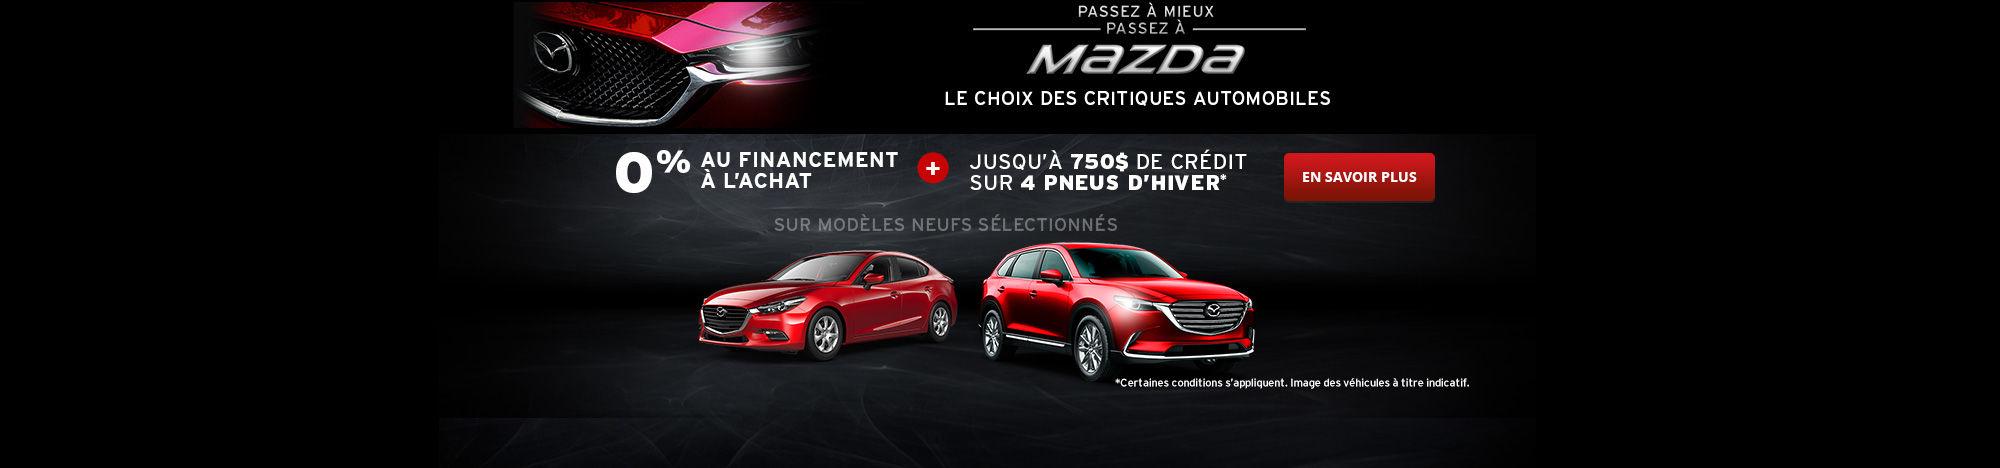 L'événement Mazda!